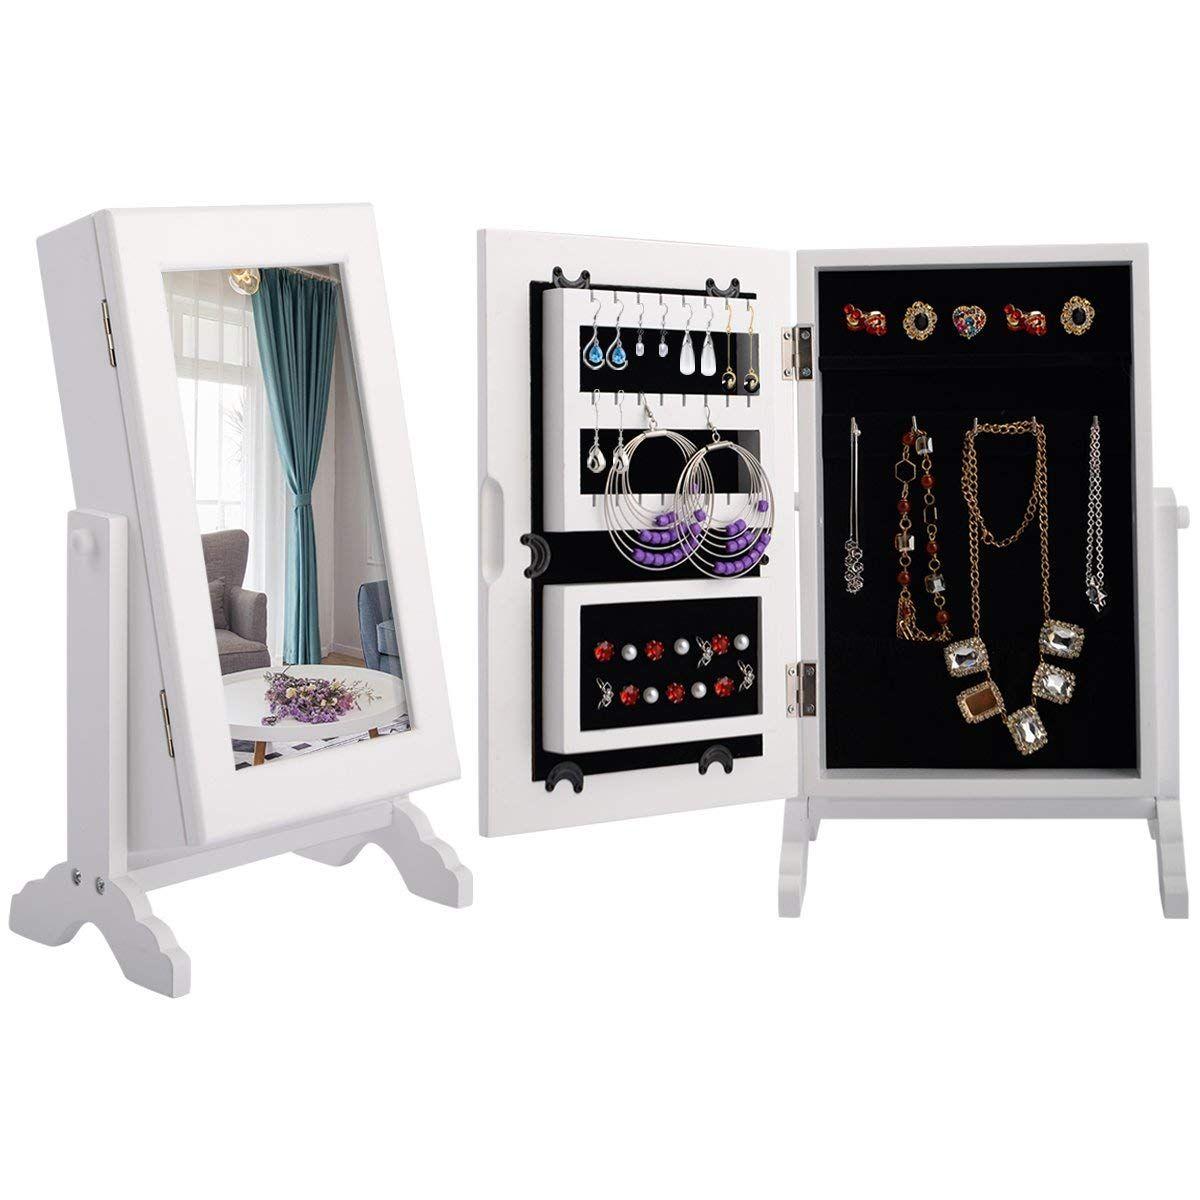 Mini Design Jewelry Cabinet Mirror Jewellery Cabinet Jewelry Cabinet Jewelry Mirror